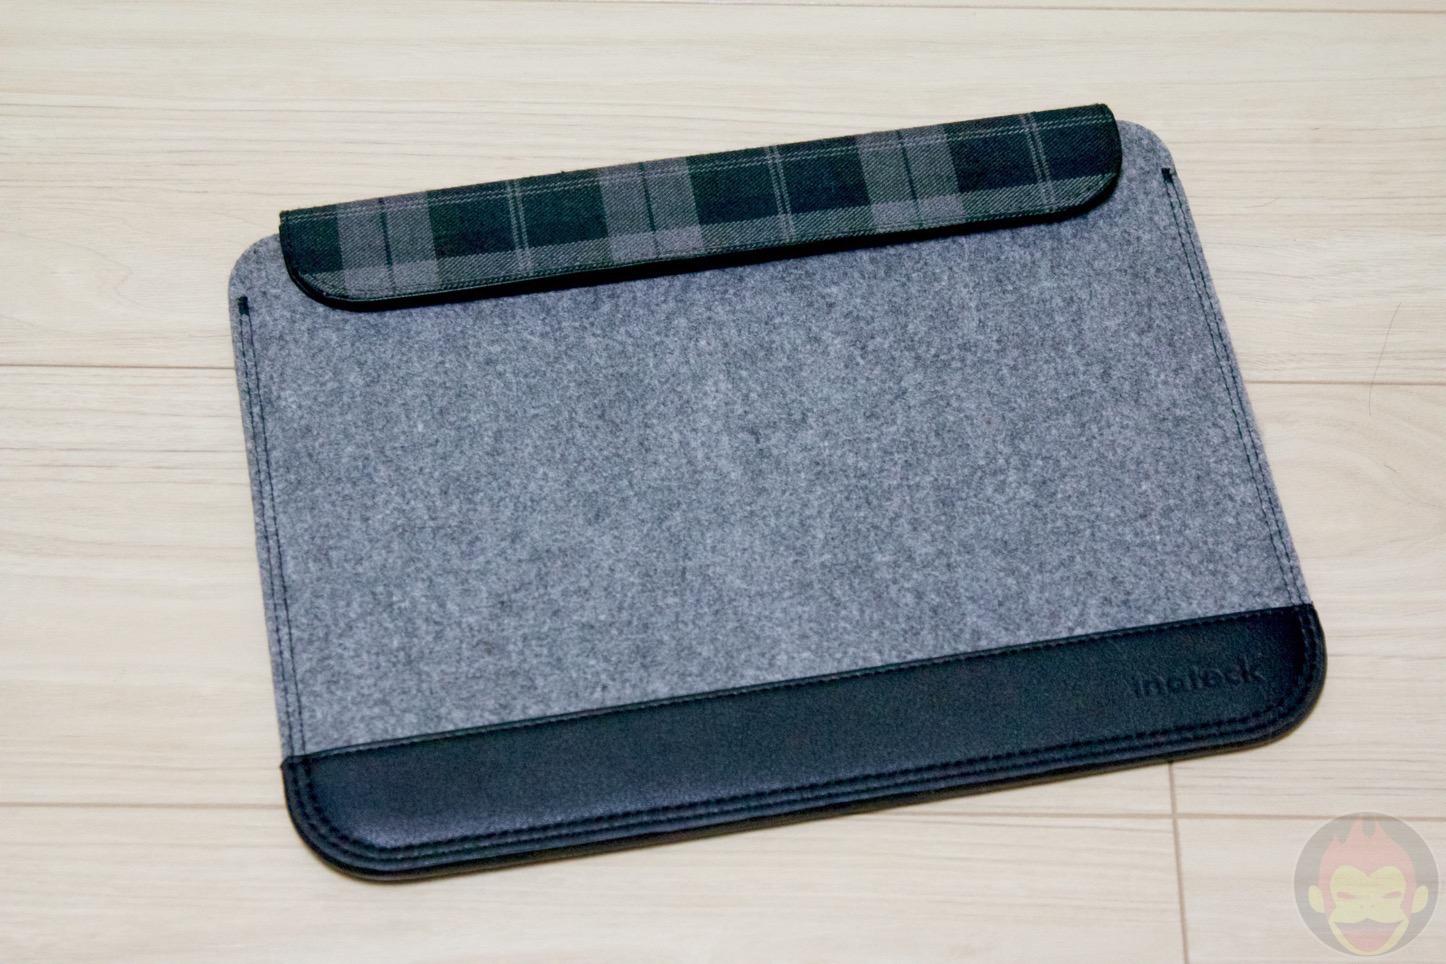 Inateck-12inch-MacBook-Case-009.jpg